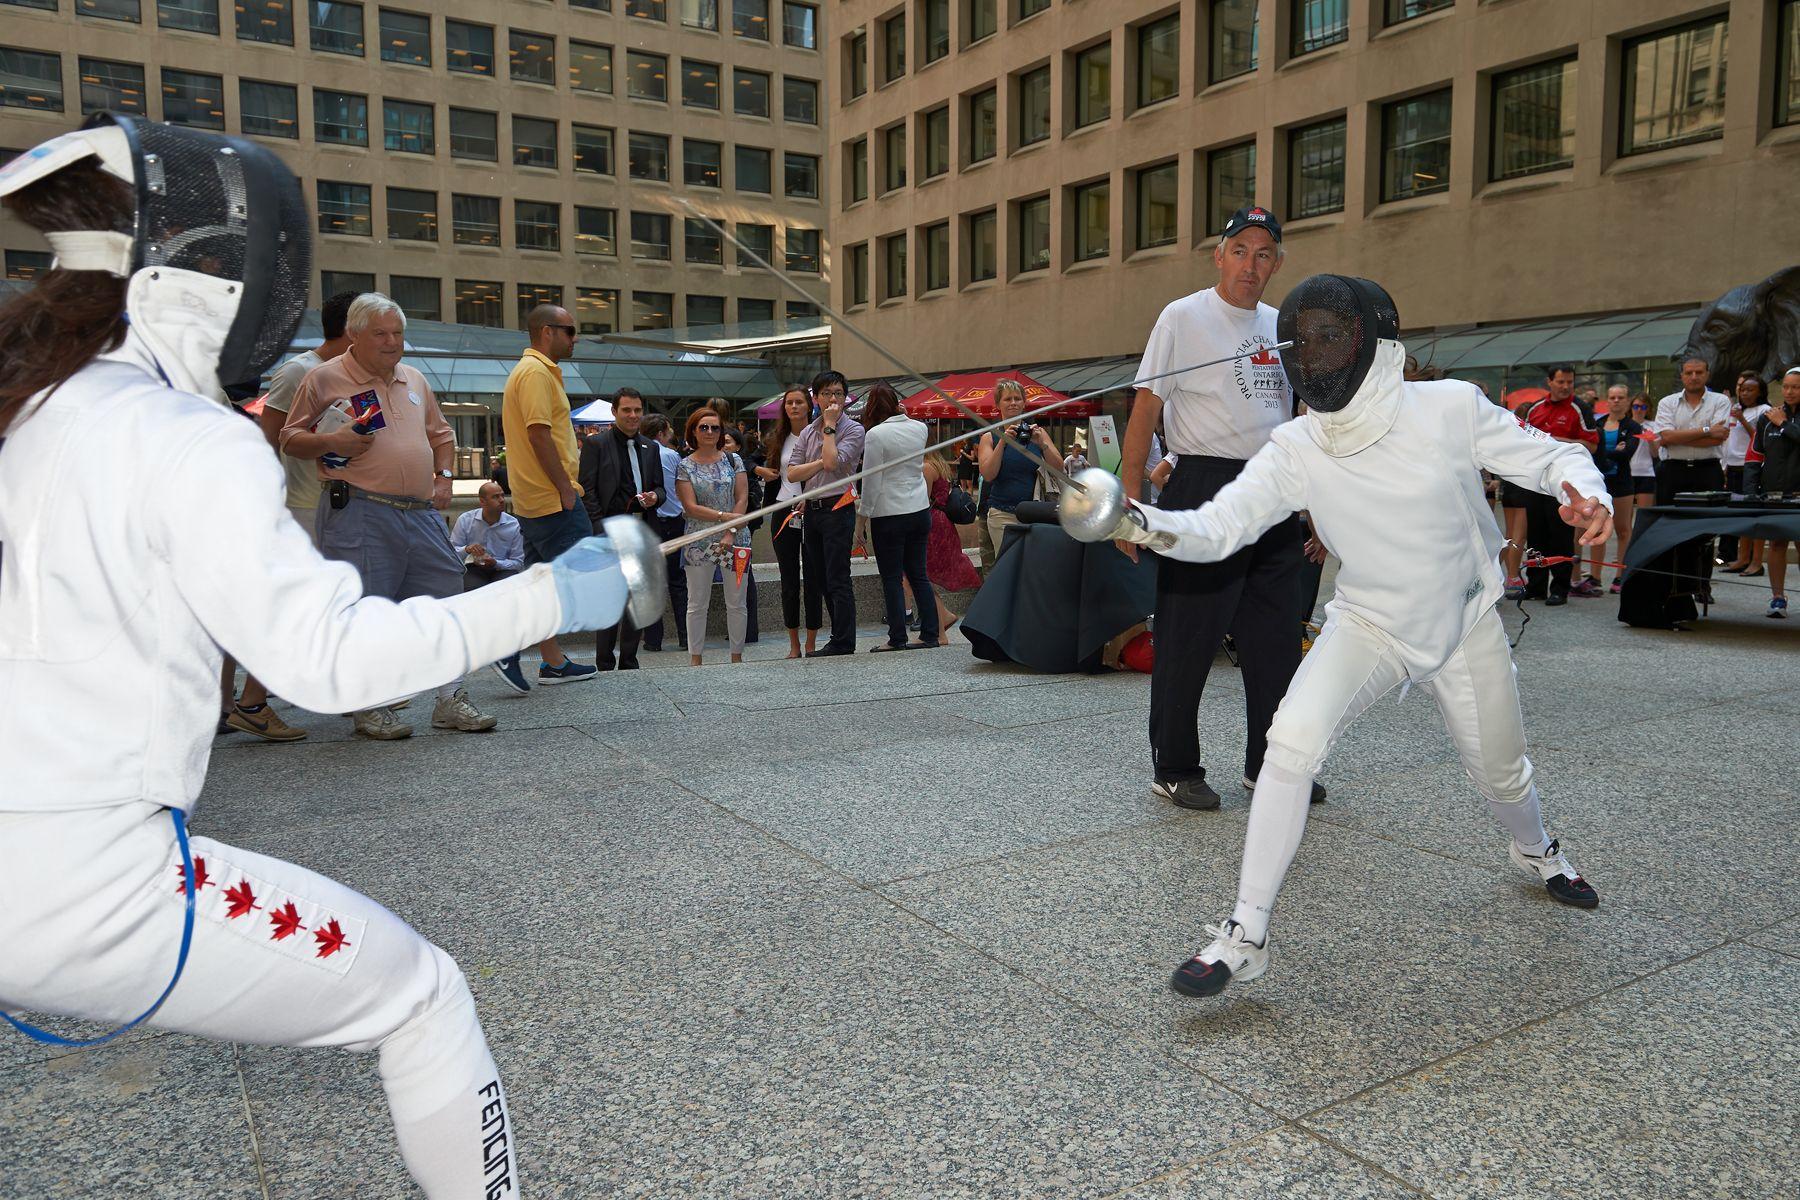 Pentathalon-Athletes-Fencing.jpg